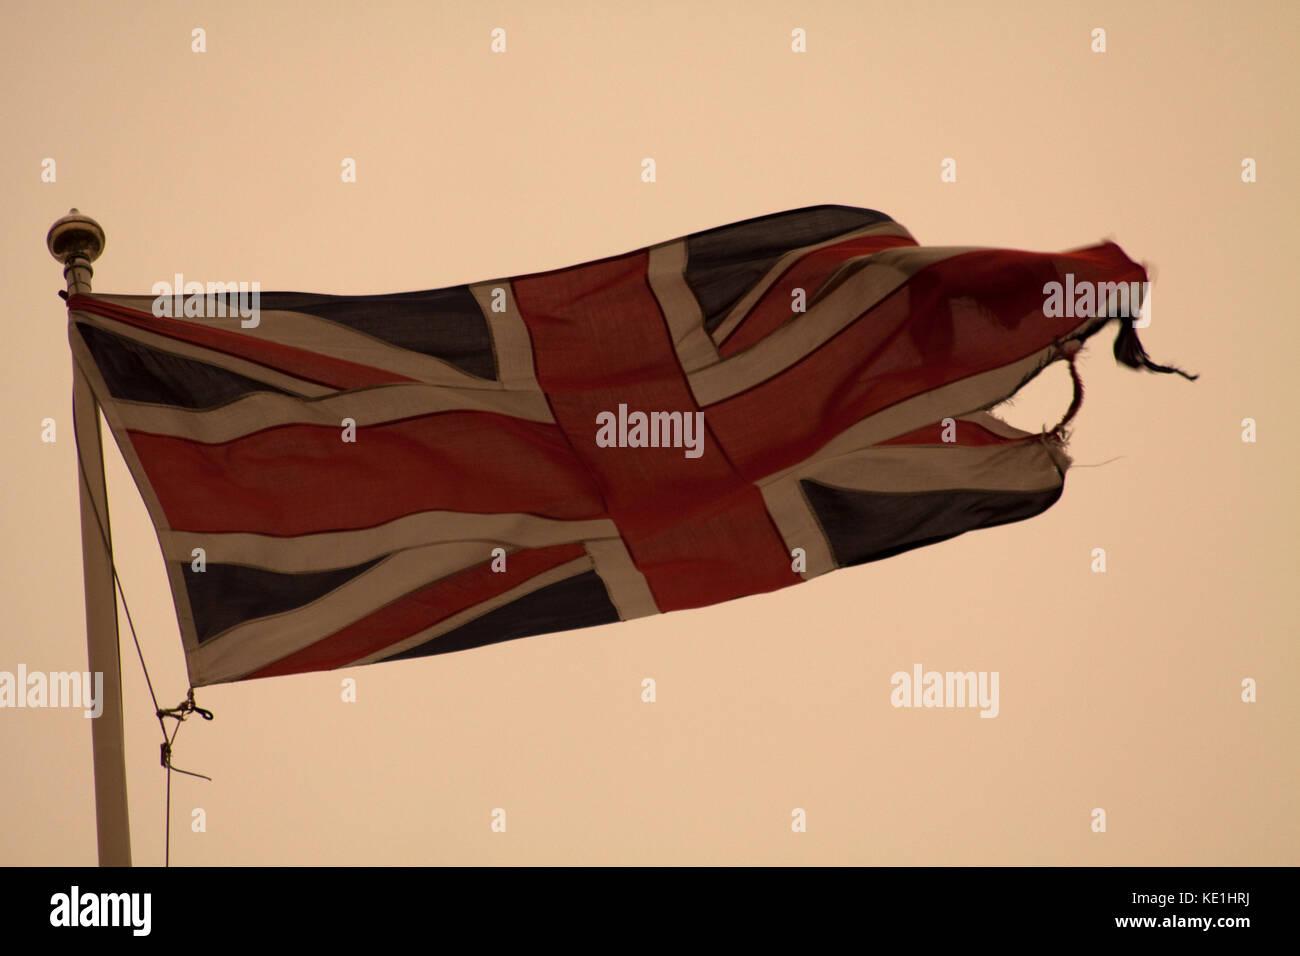 Union Jack with Ophelia Sky behind - Stock Image